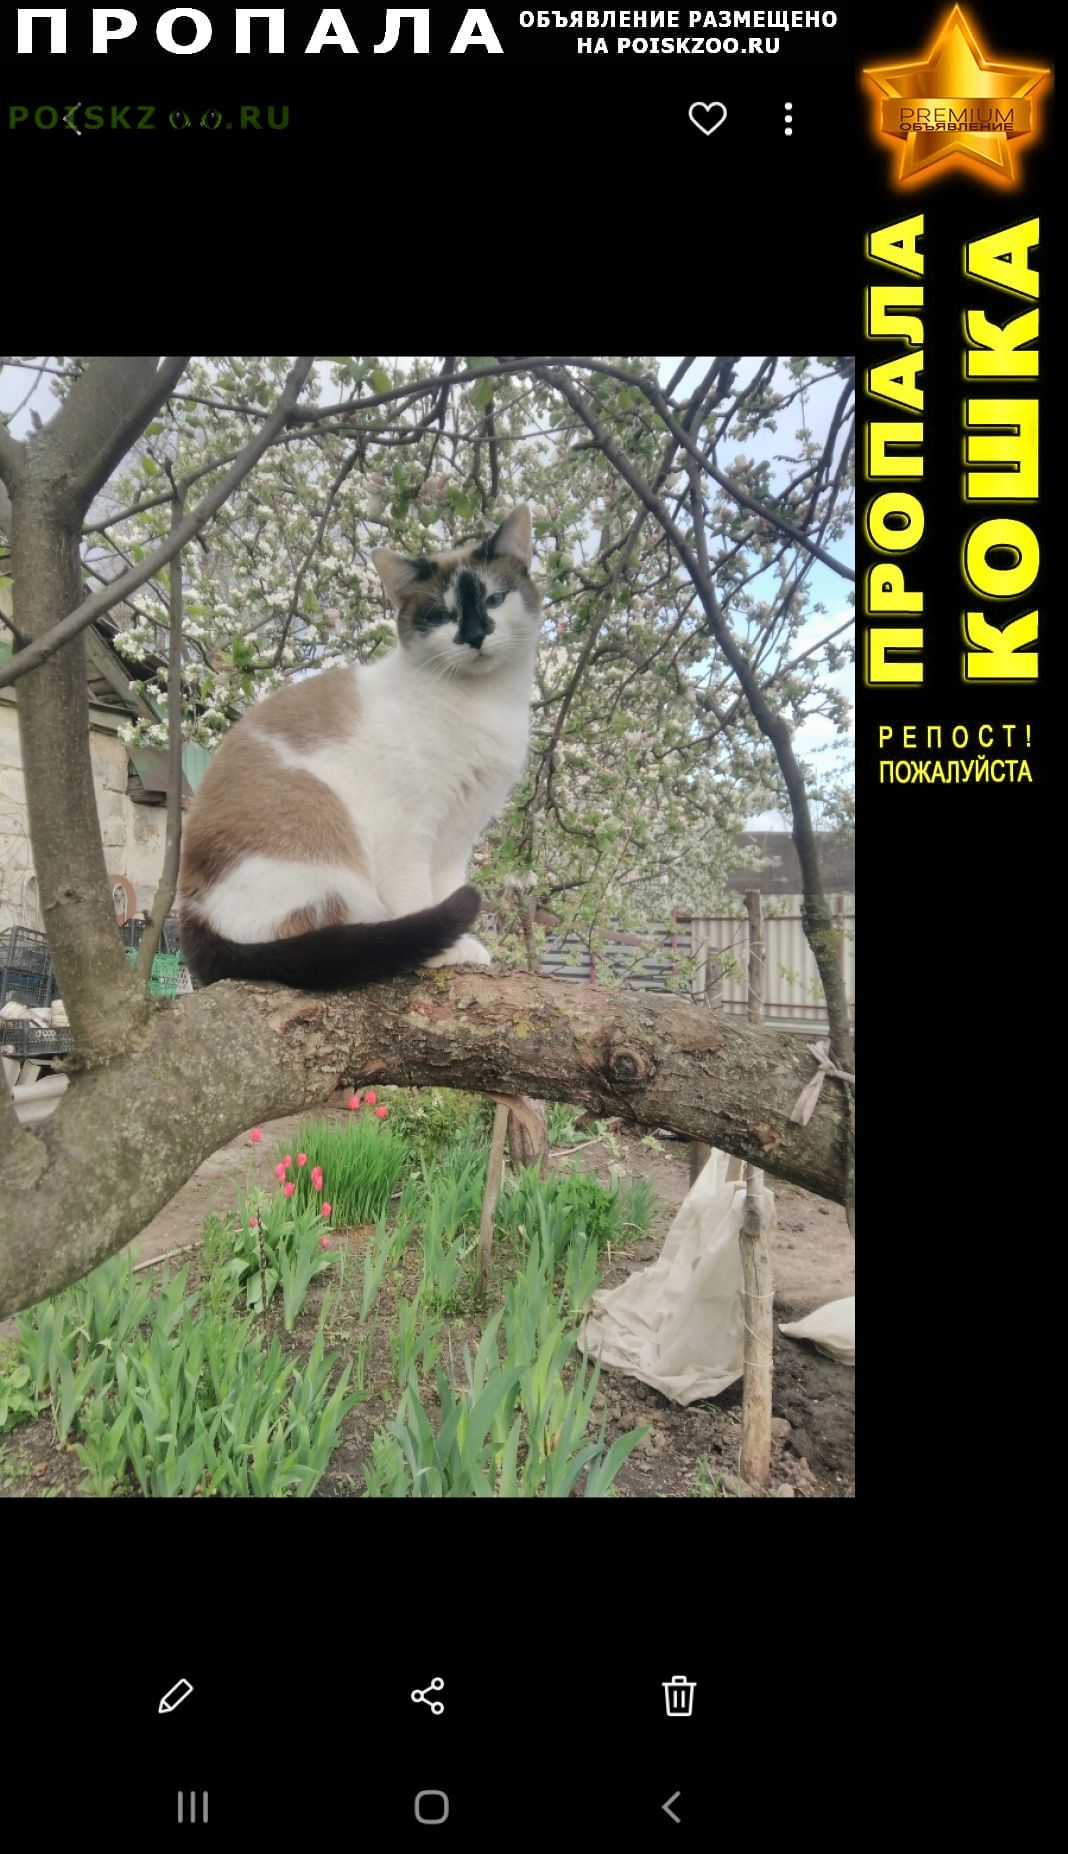 Пропала кошка домашняя Курск